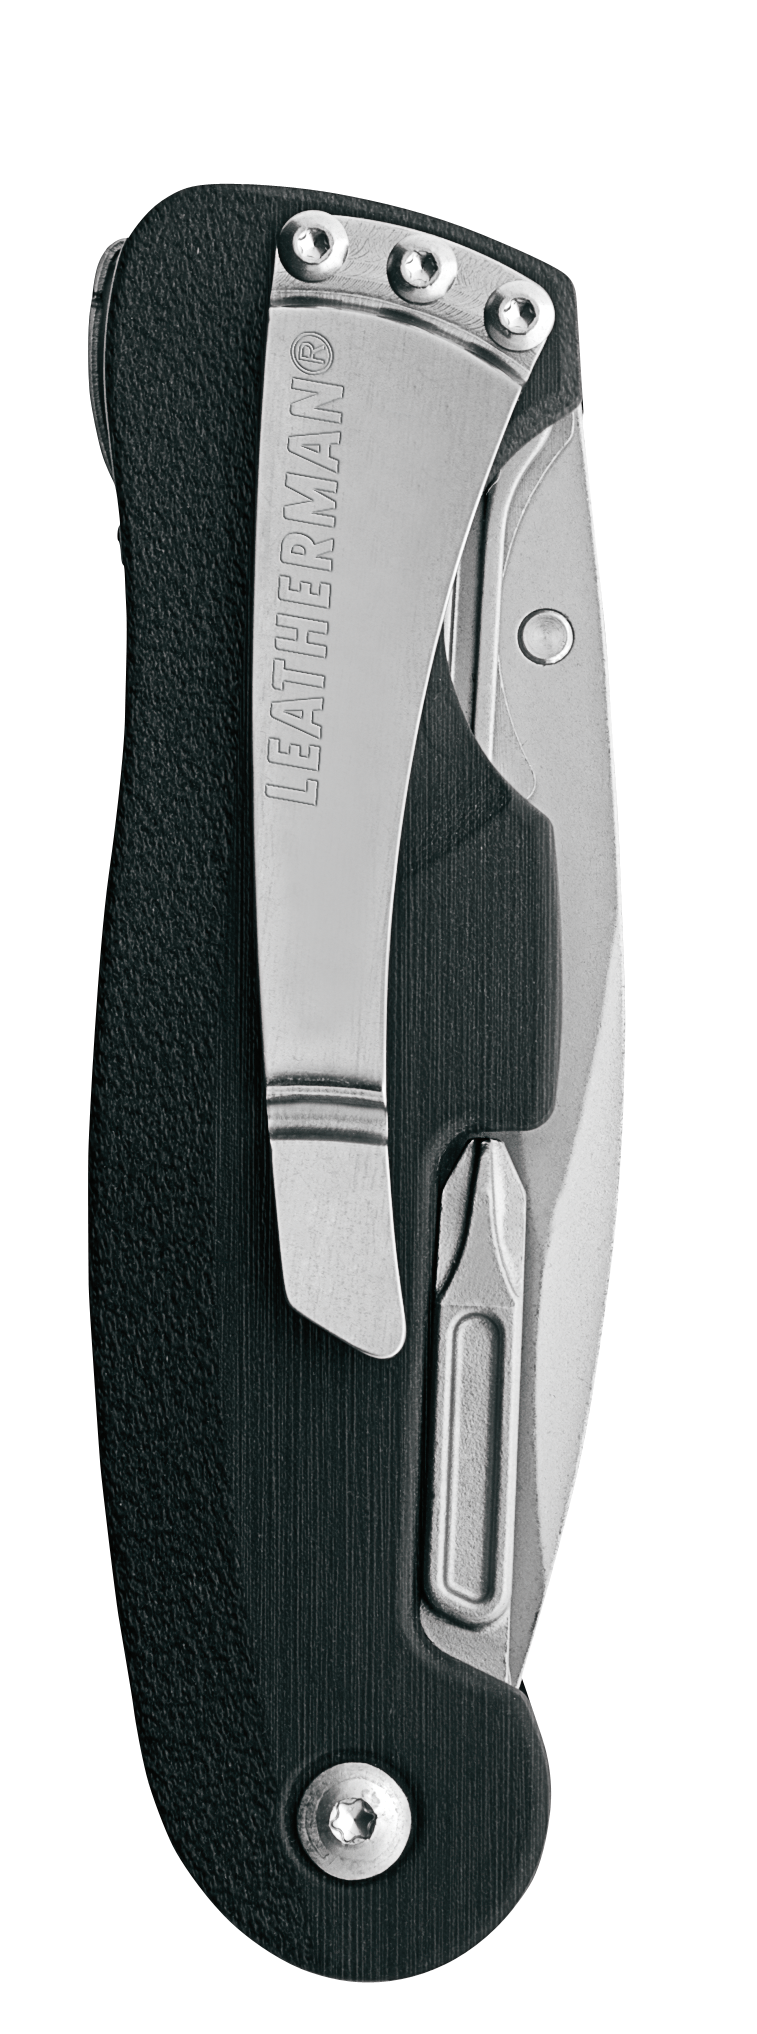 Нож Leatherman c33T